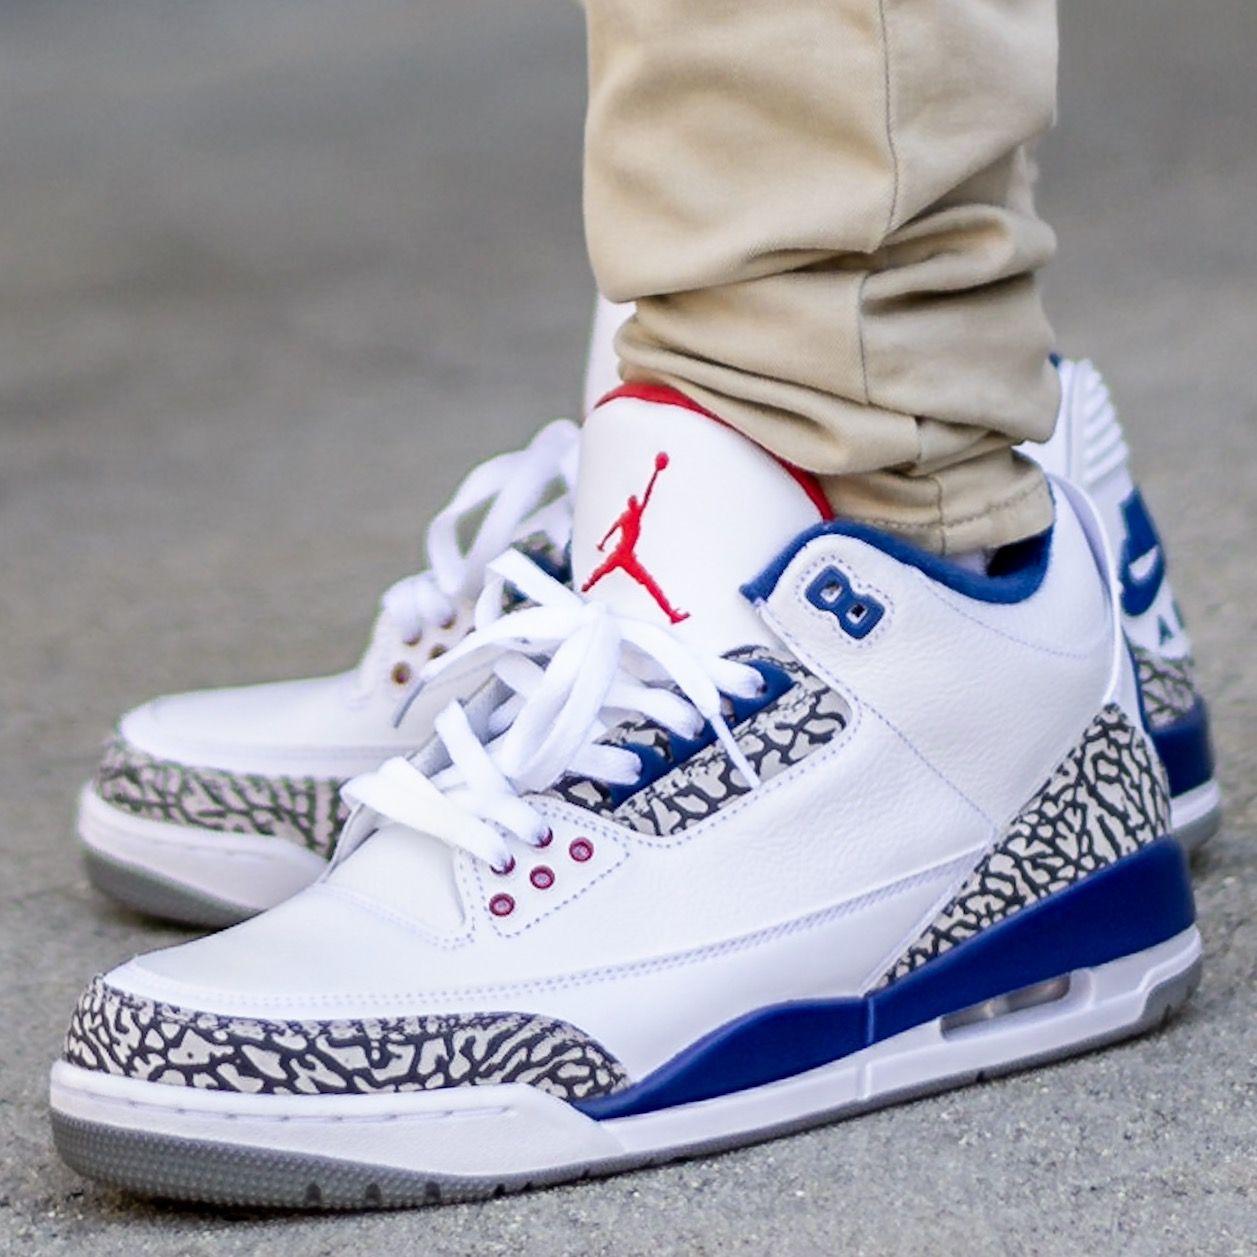 2016 Air Jordan 3 True Blue On Feet Sneaker Review Nike